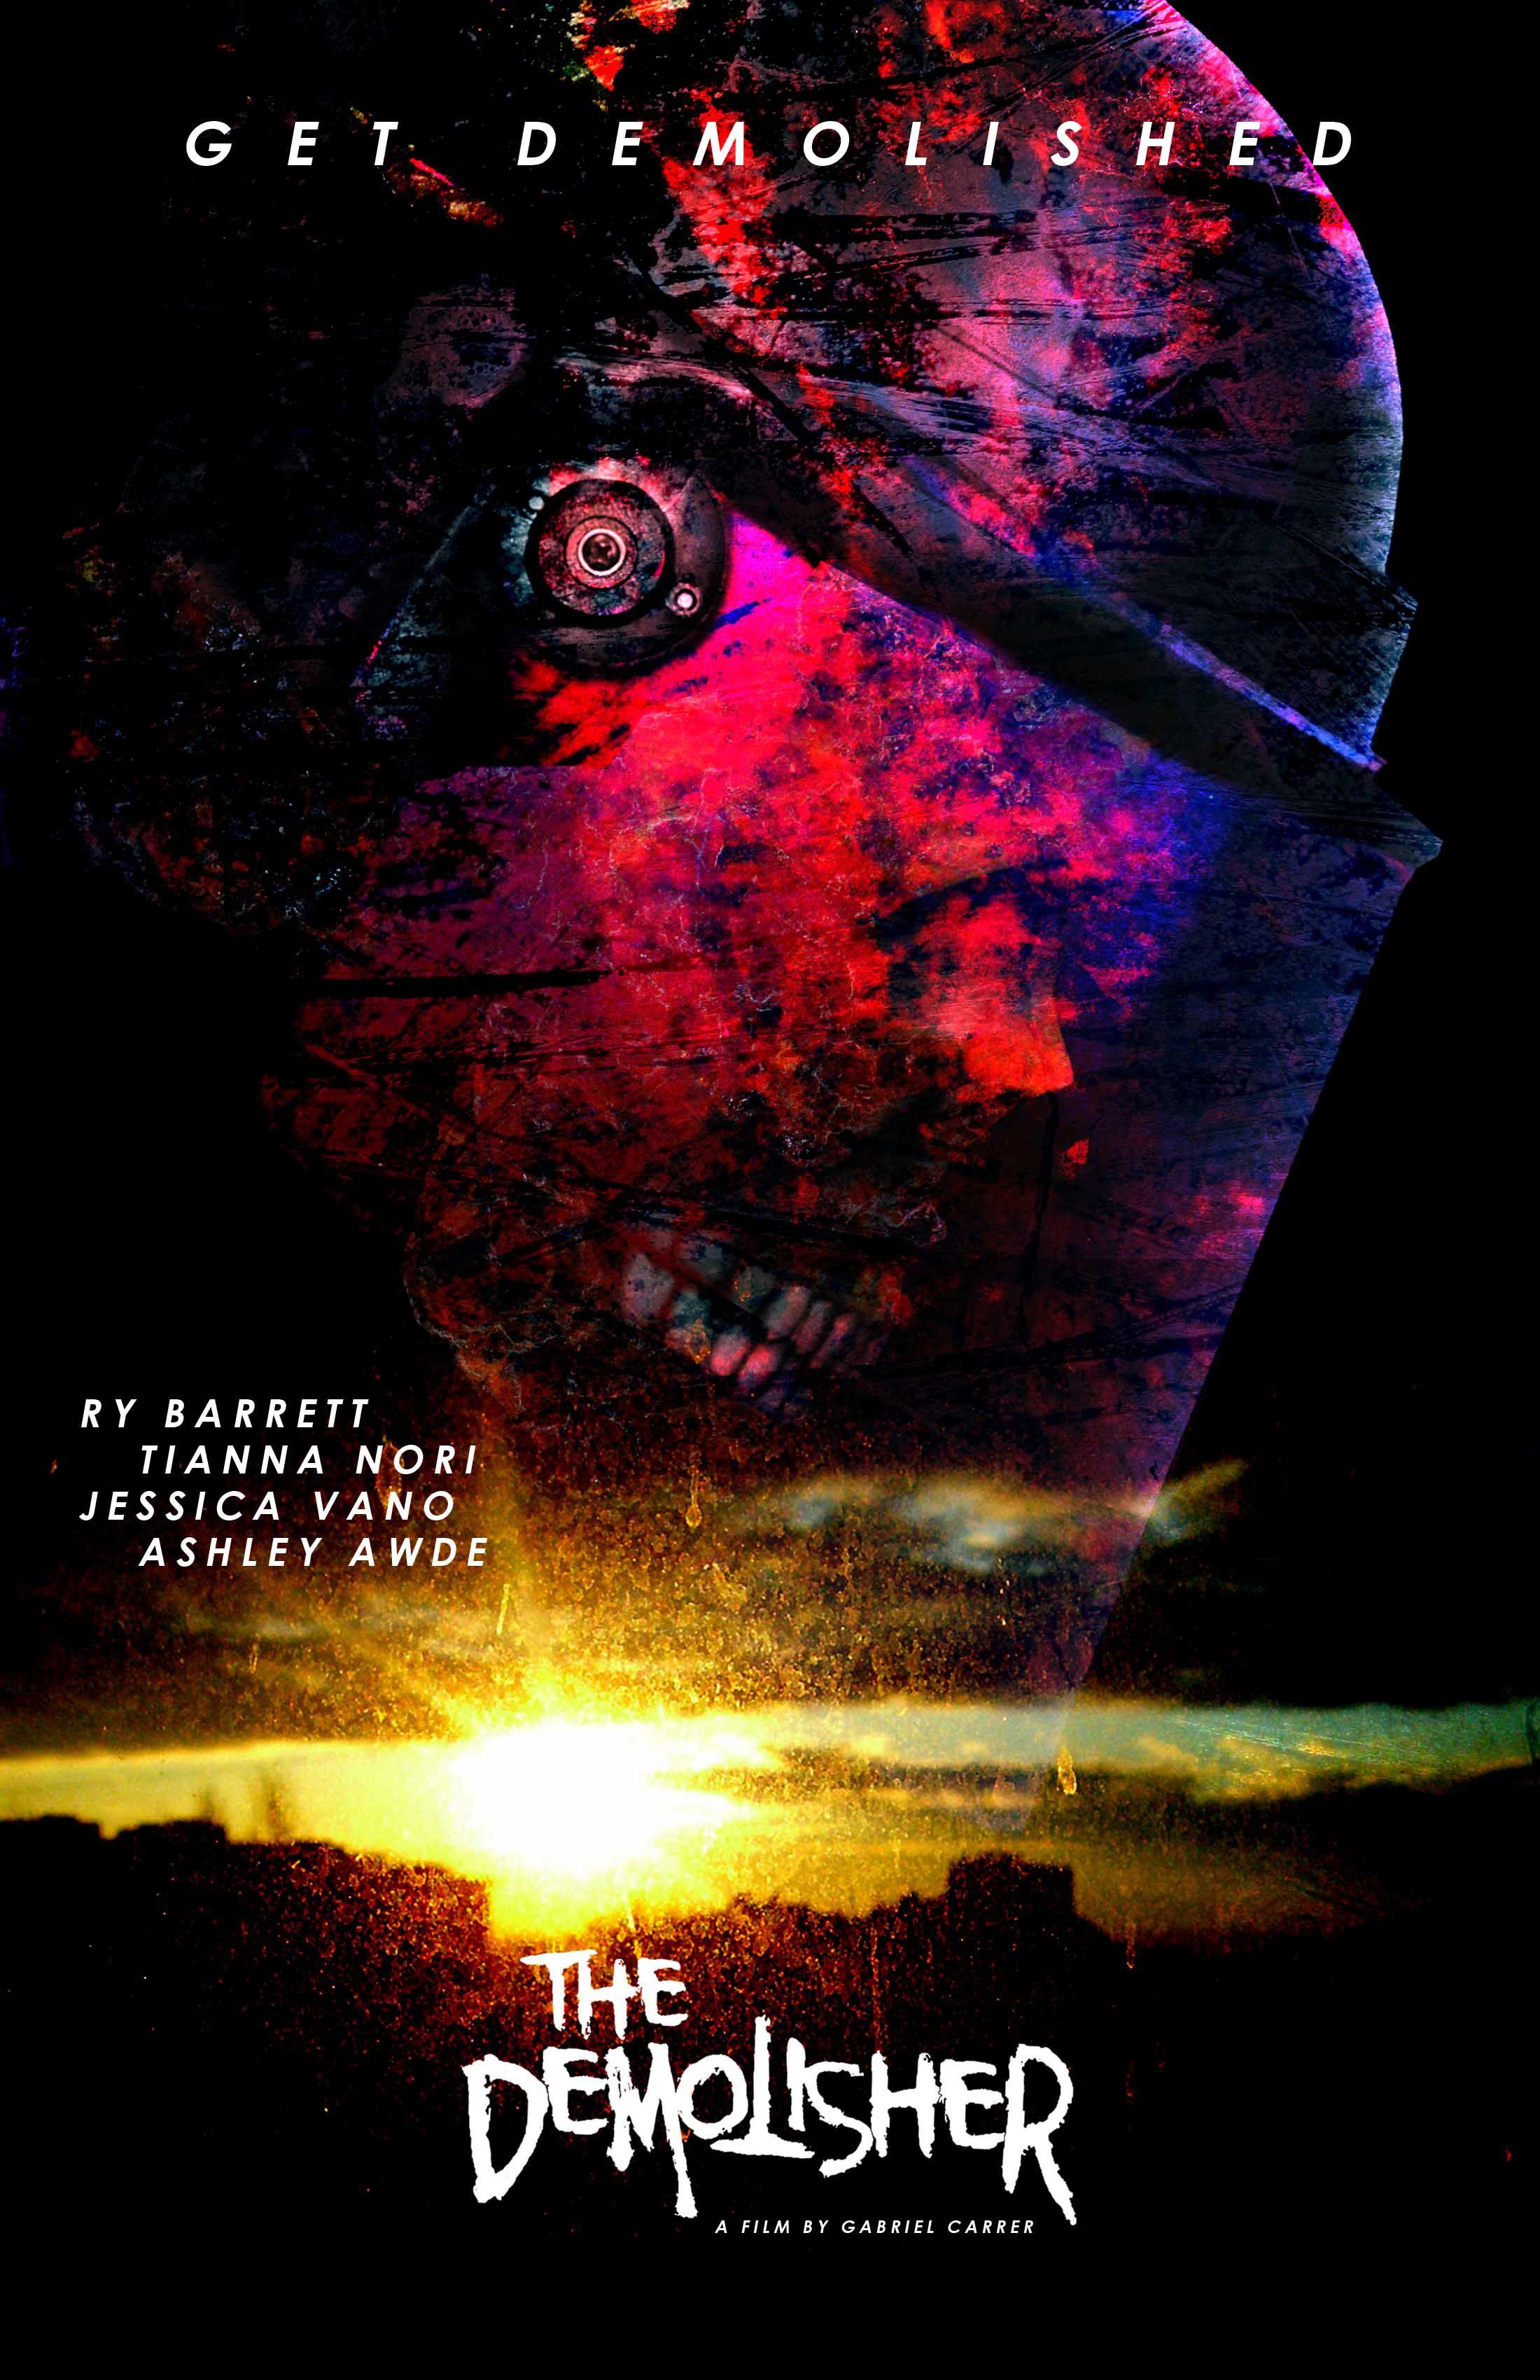 The demolisher - Film (2016)